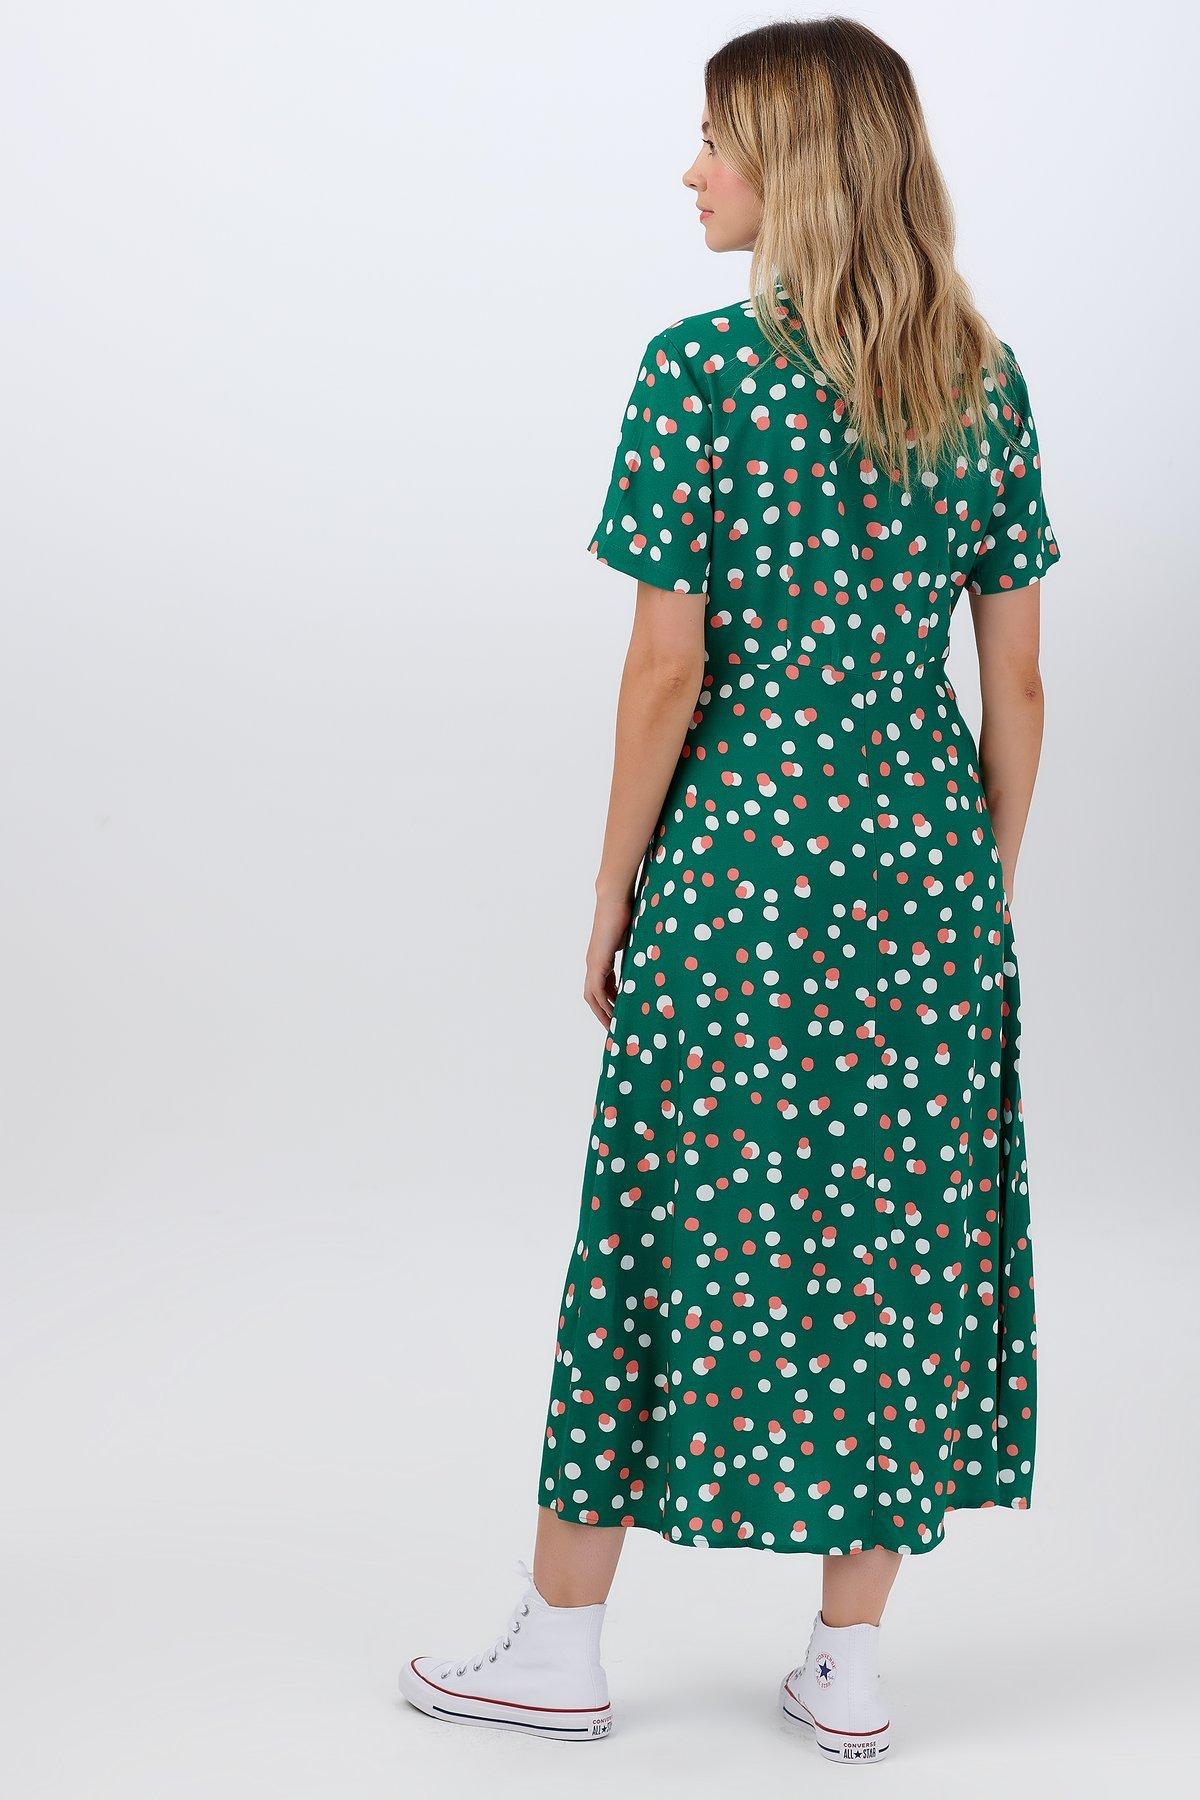 Sugarhill Brighton - Danielle Shirt Dress Green Dappled Spot